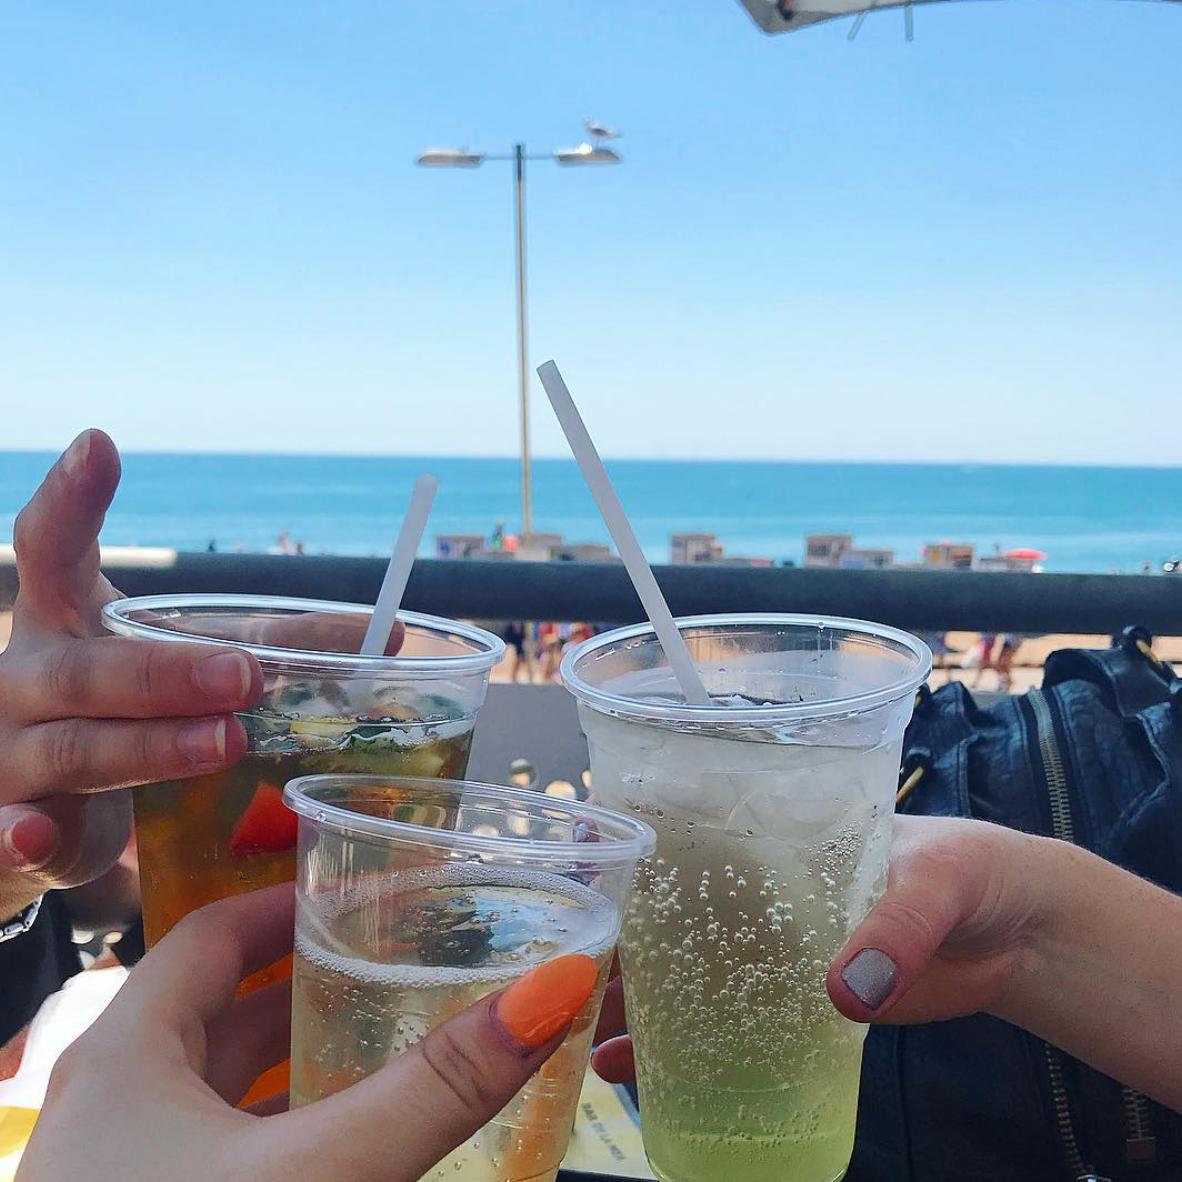 brighton girl problems interview beach drinks